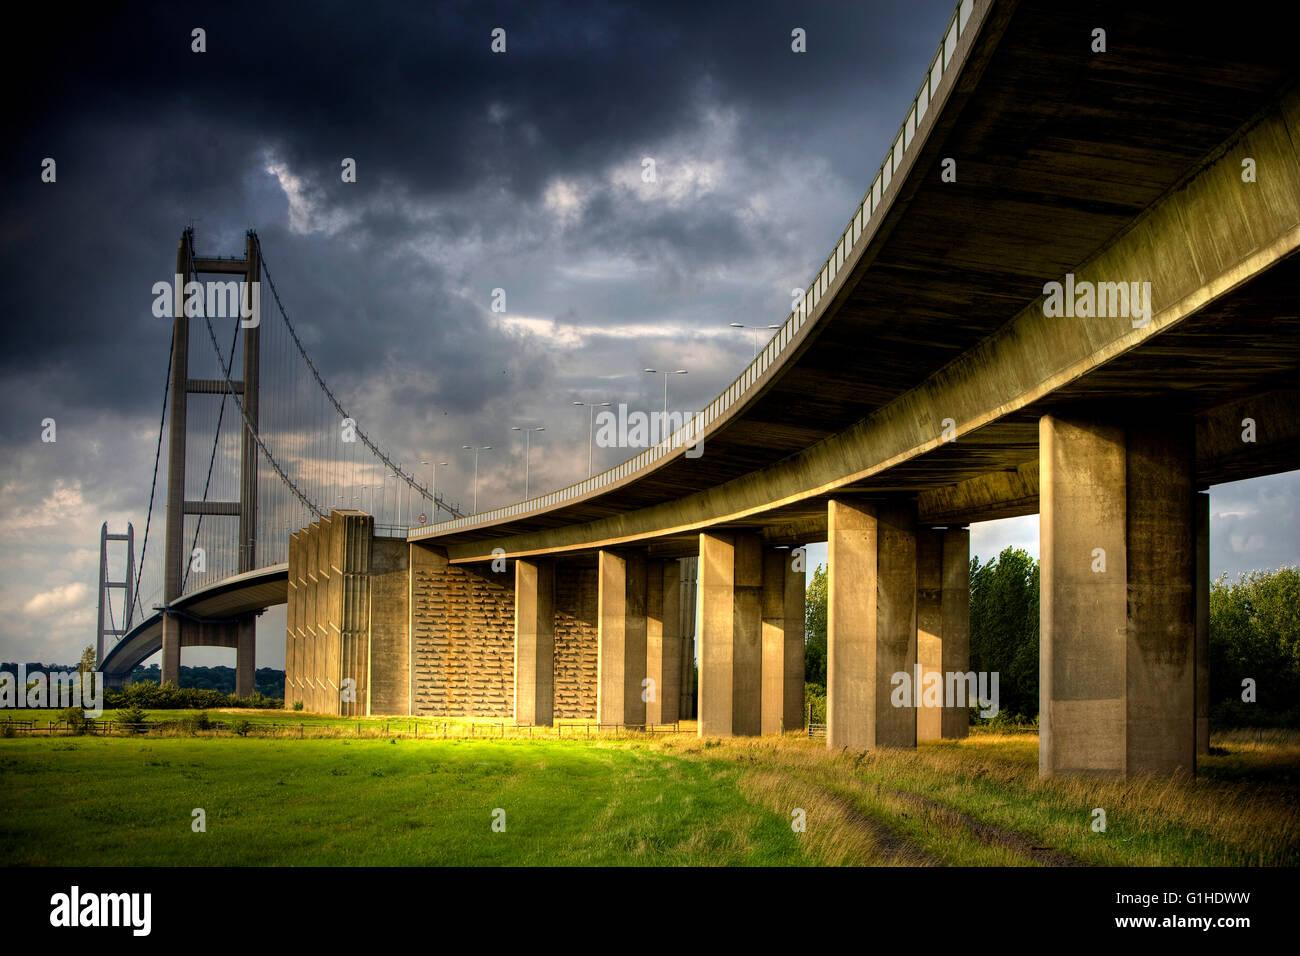 Le Humber Bridge, Humberside, Nord de l'Angleterre. Photo Stock